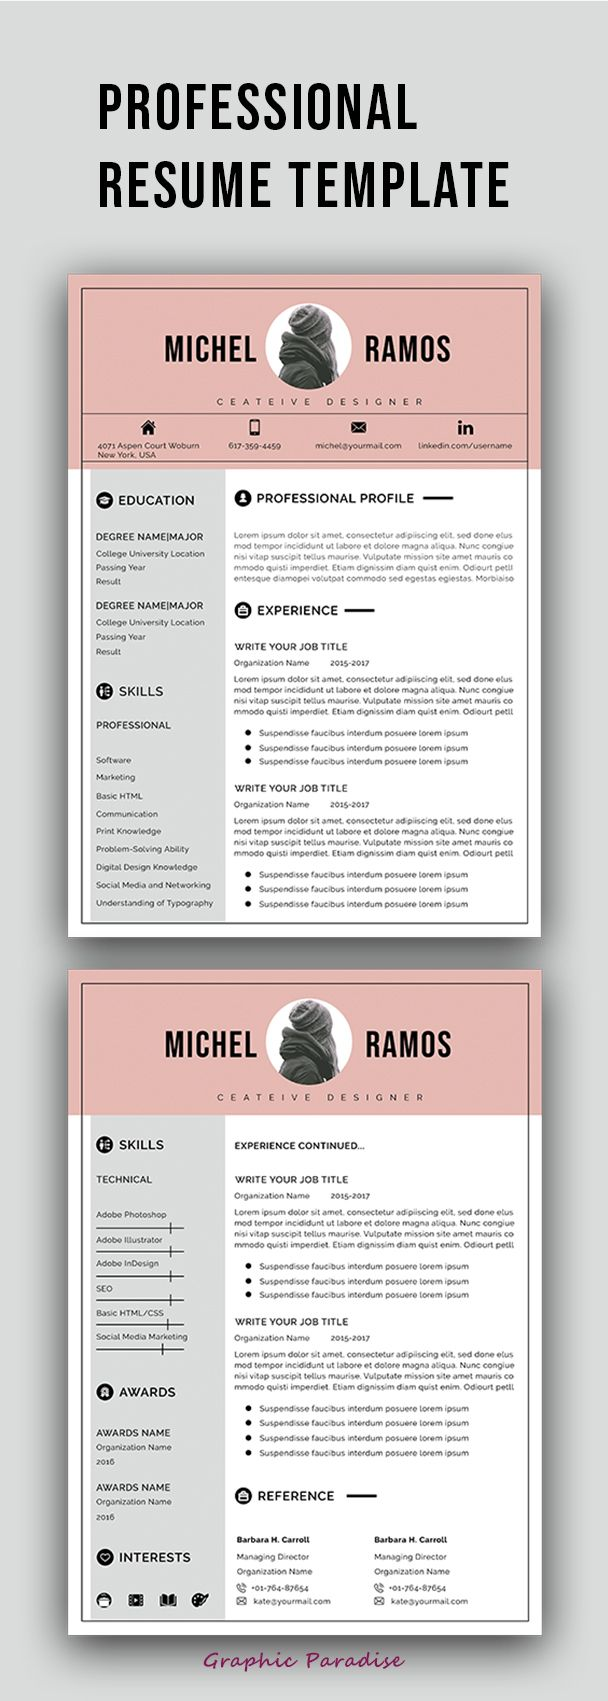 Microsoft Word Resume Template For Mac Professional Resume Template Instant Download Ms Word Resume .